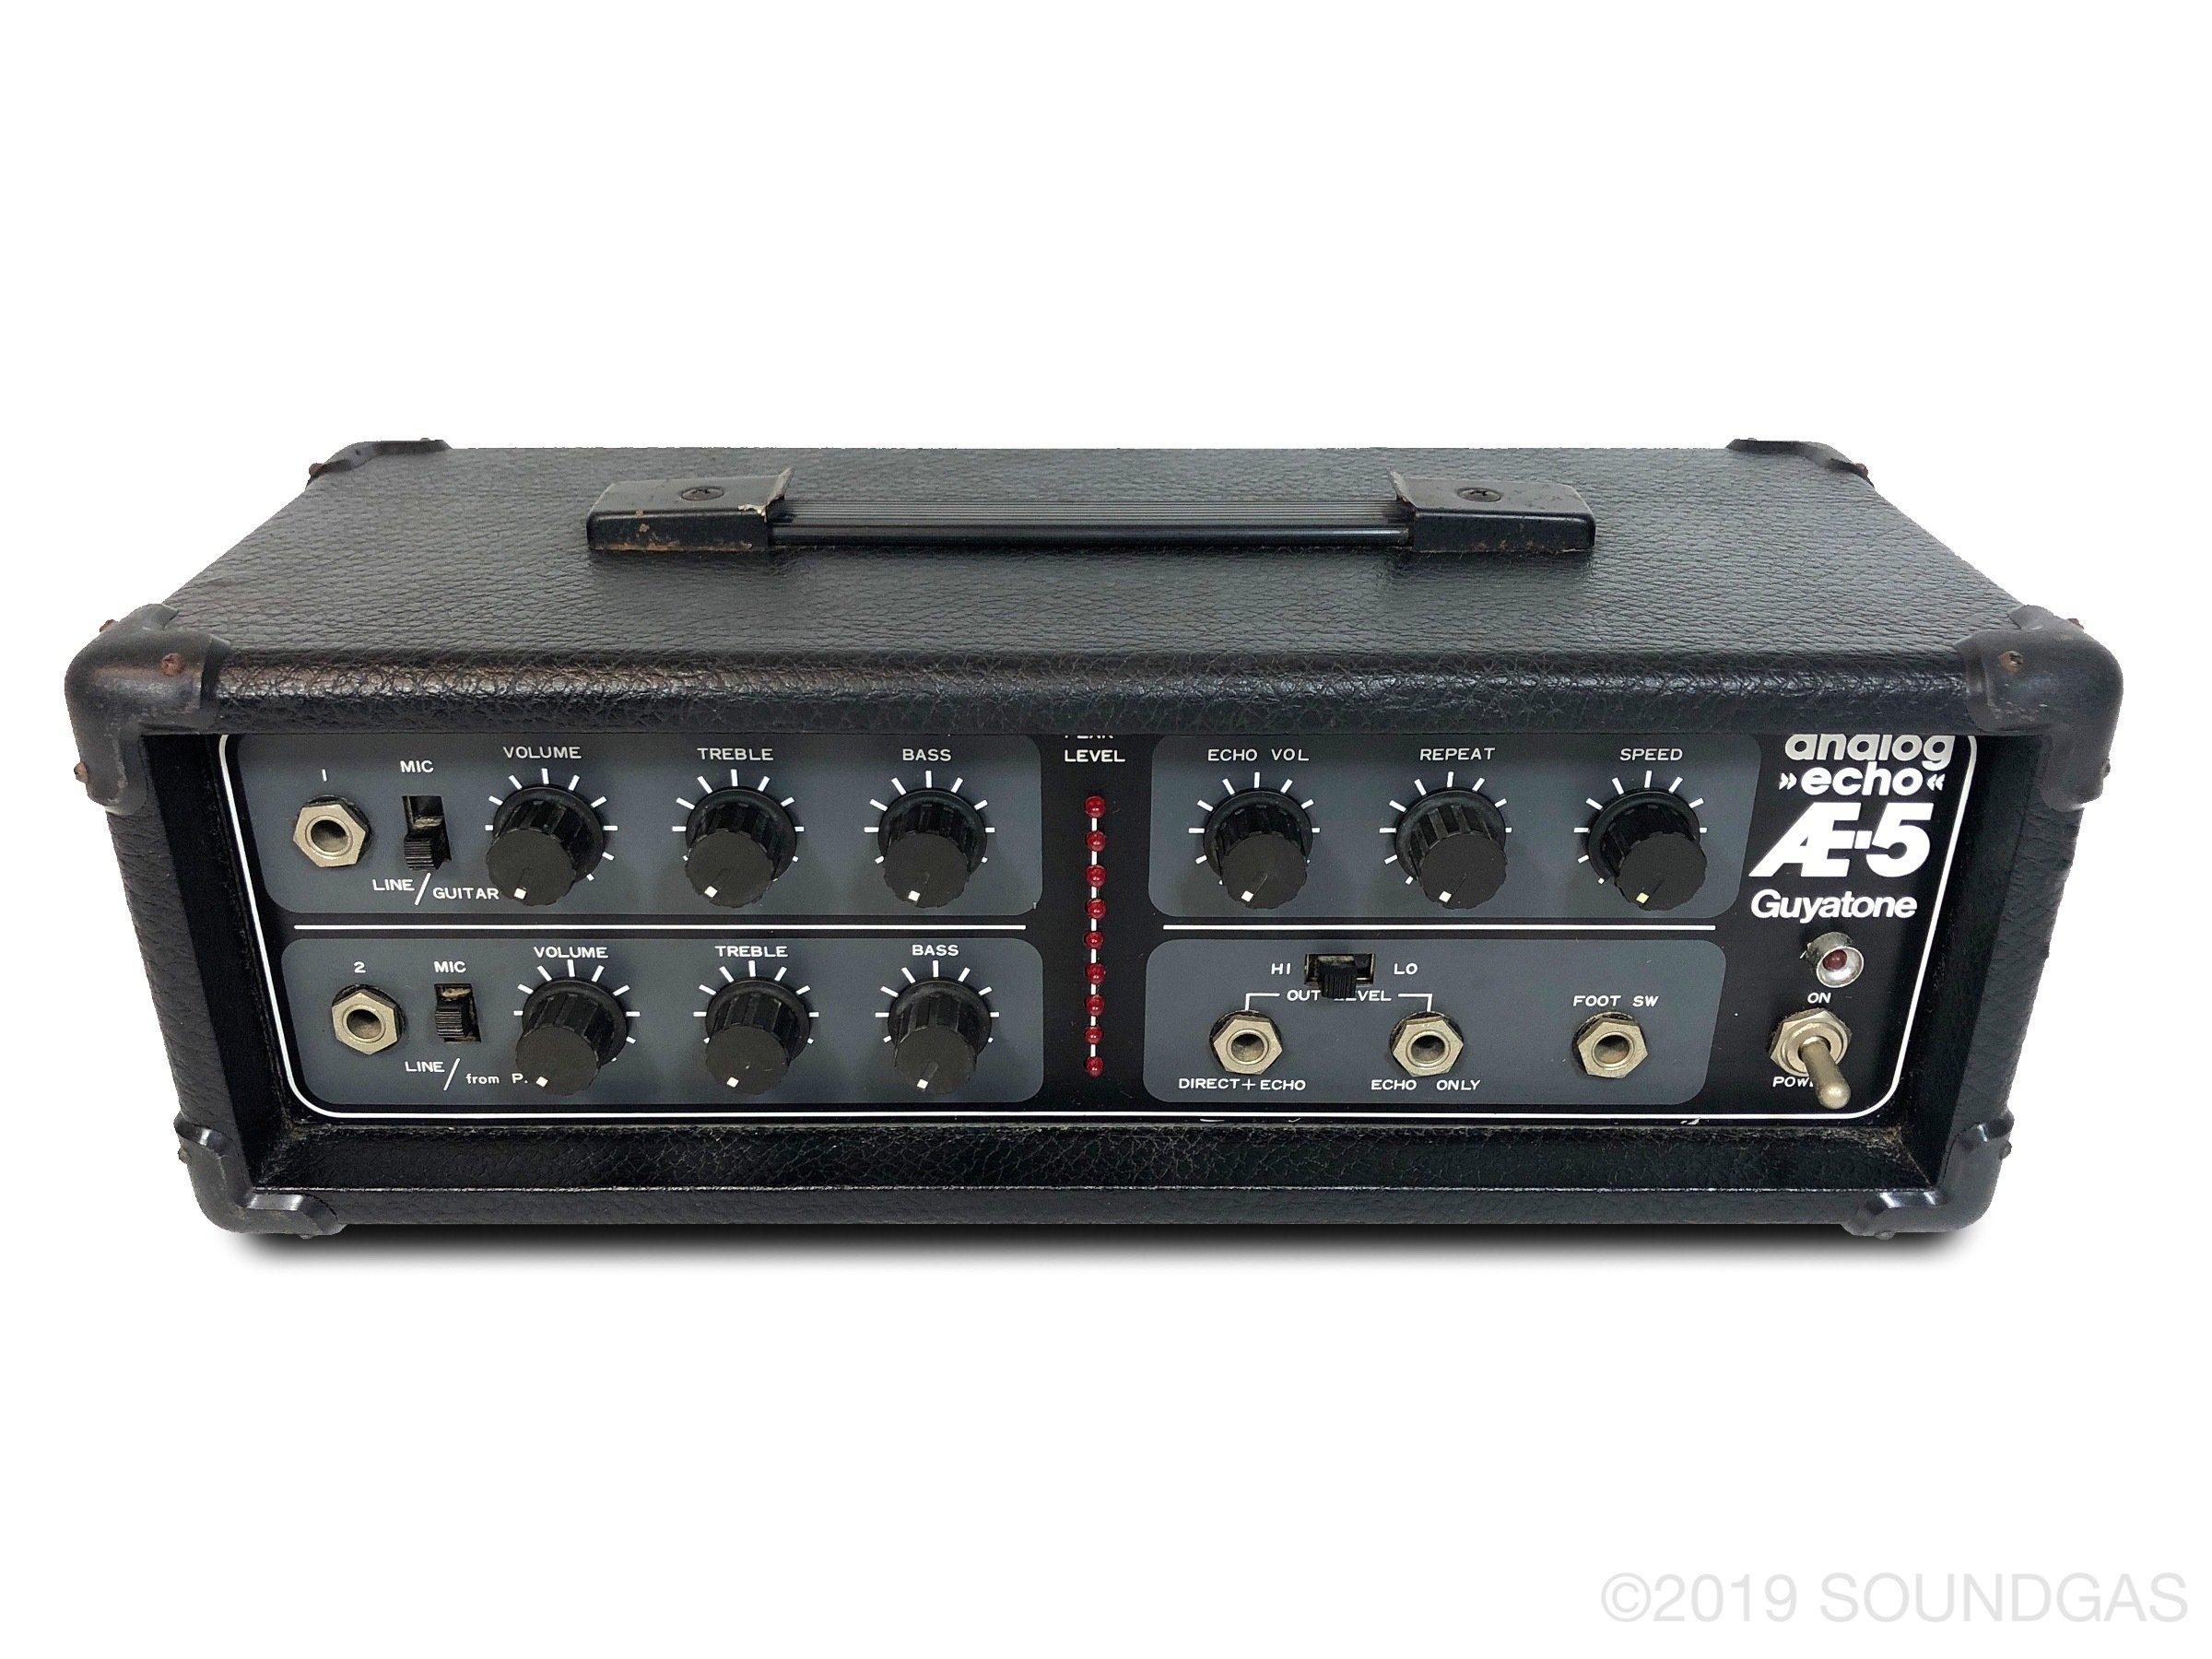 Guyatone AE-5 Analog Echo